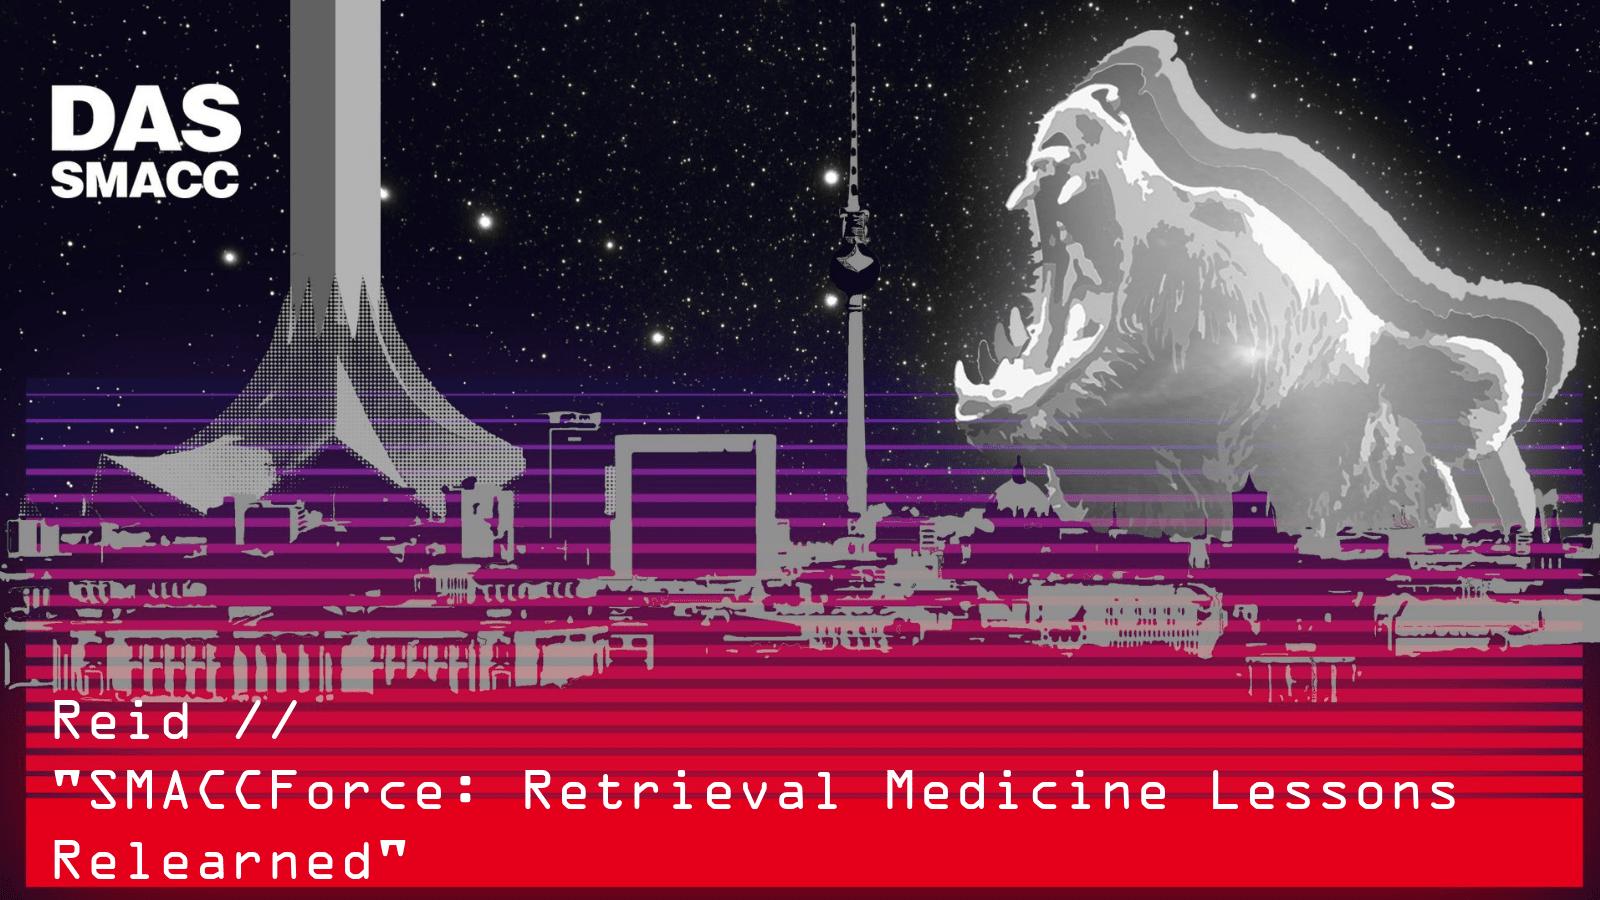 Retrieval Medicine Lessons Relearned